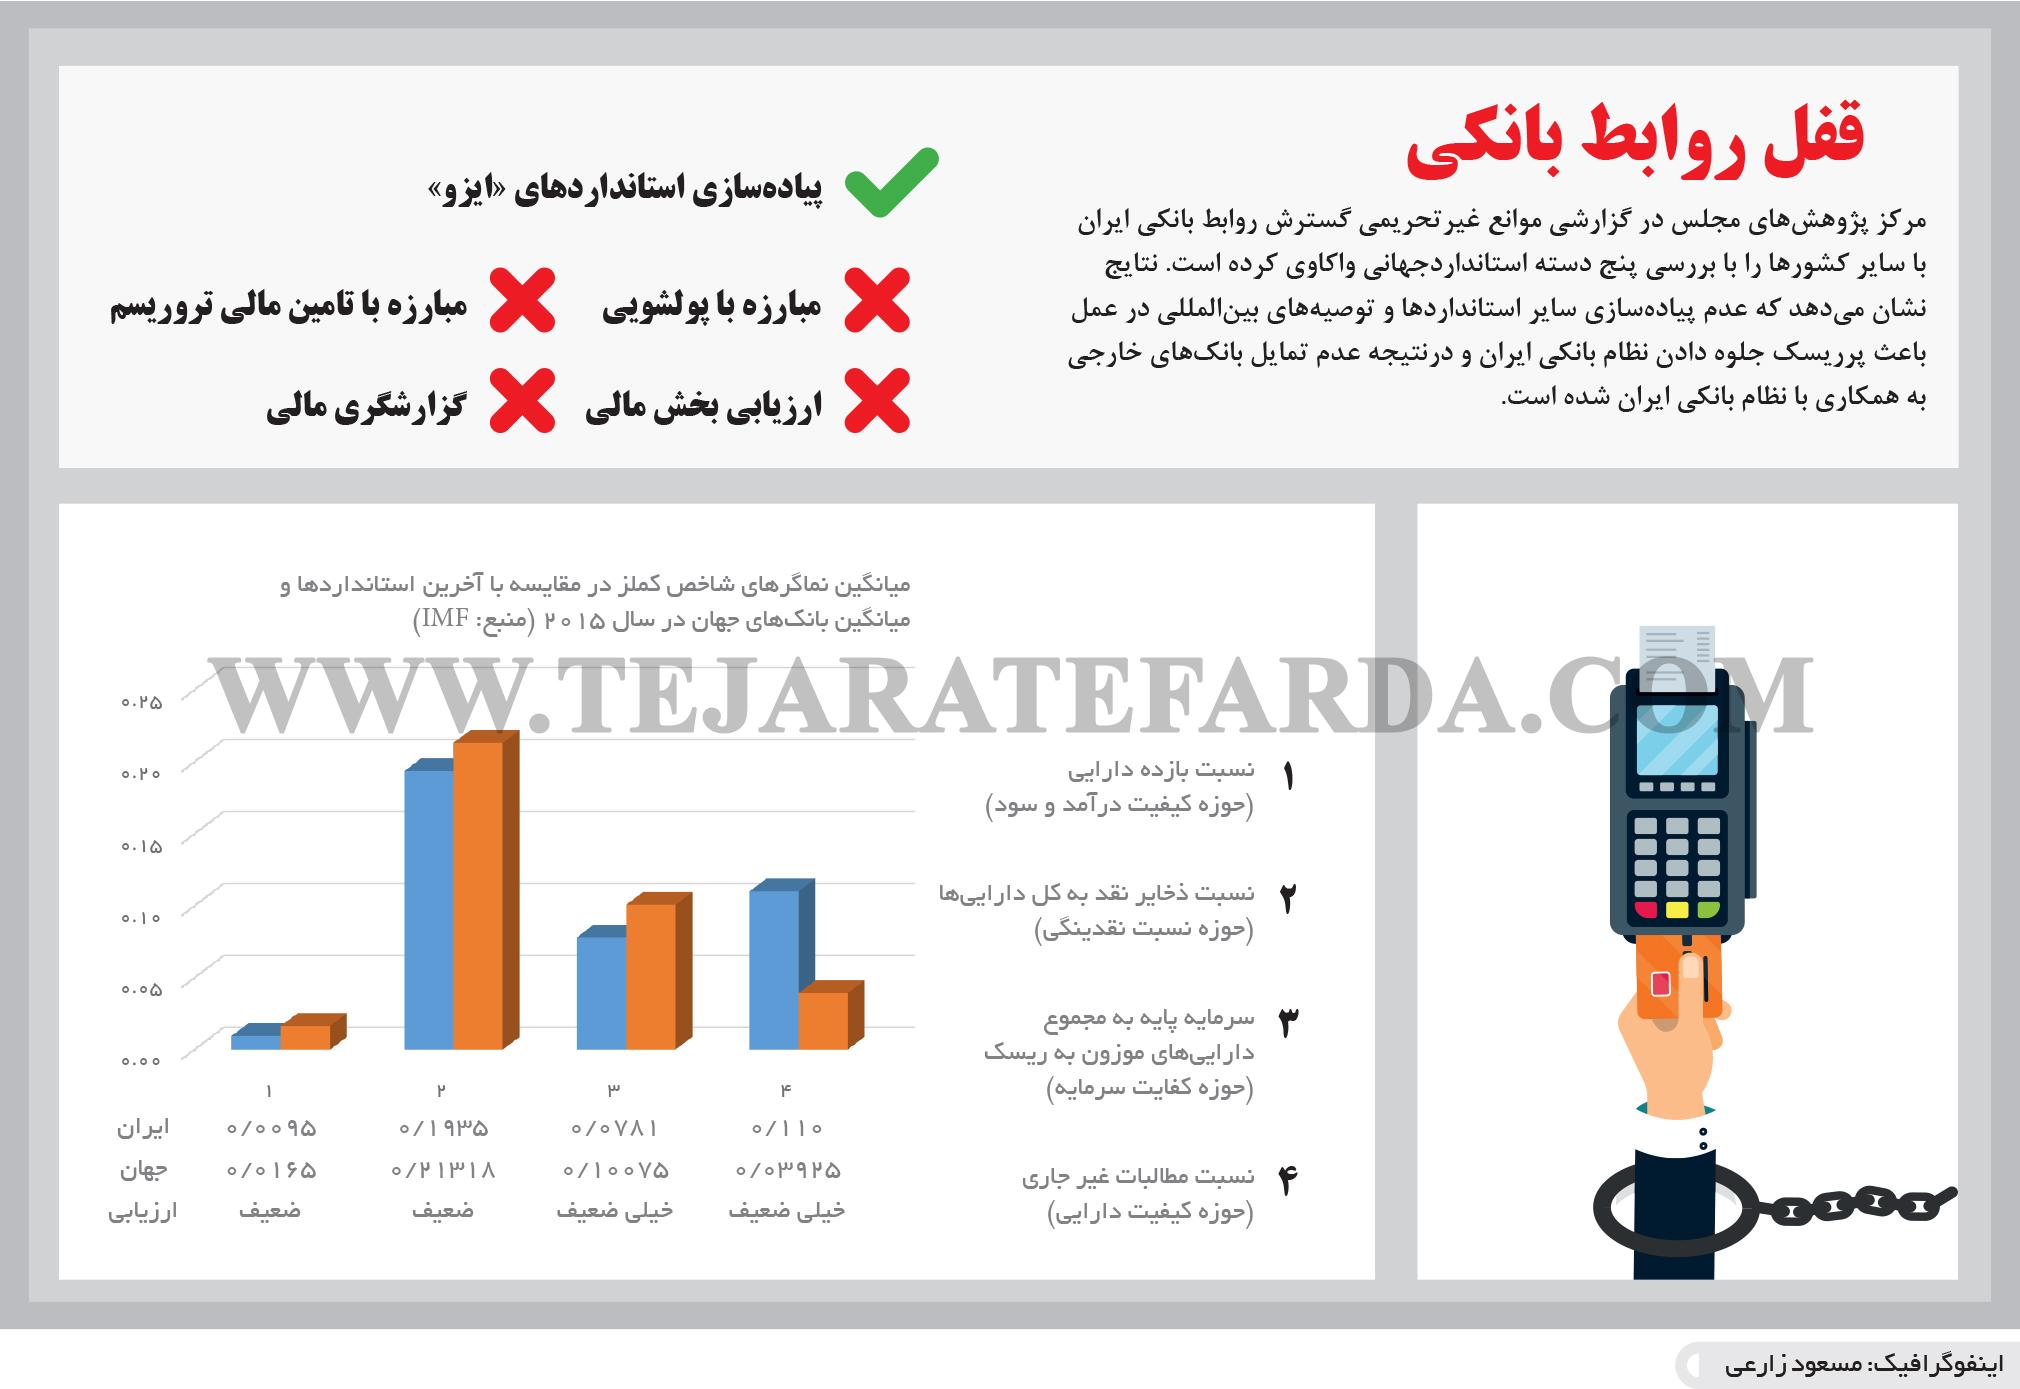 تجارت فردا- اینفوگرافیک- قفل روابط بانکی